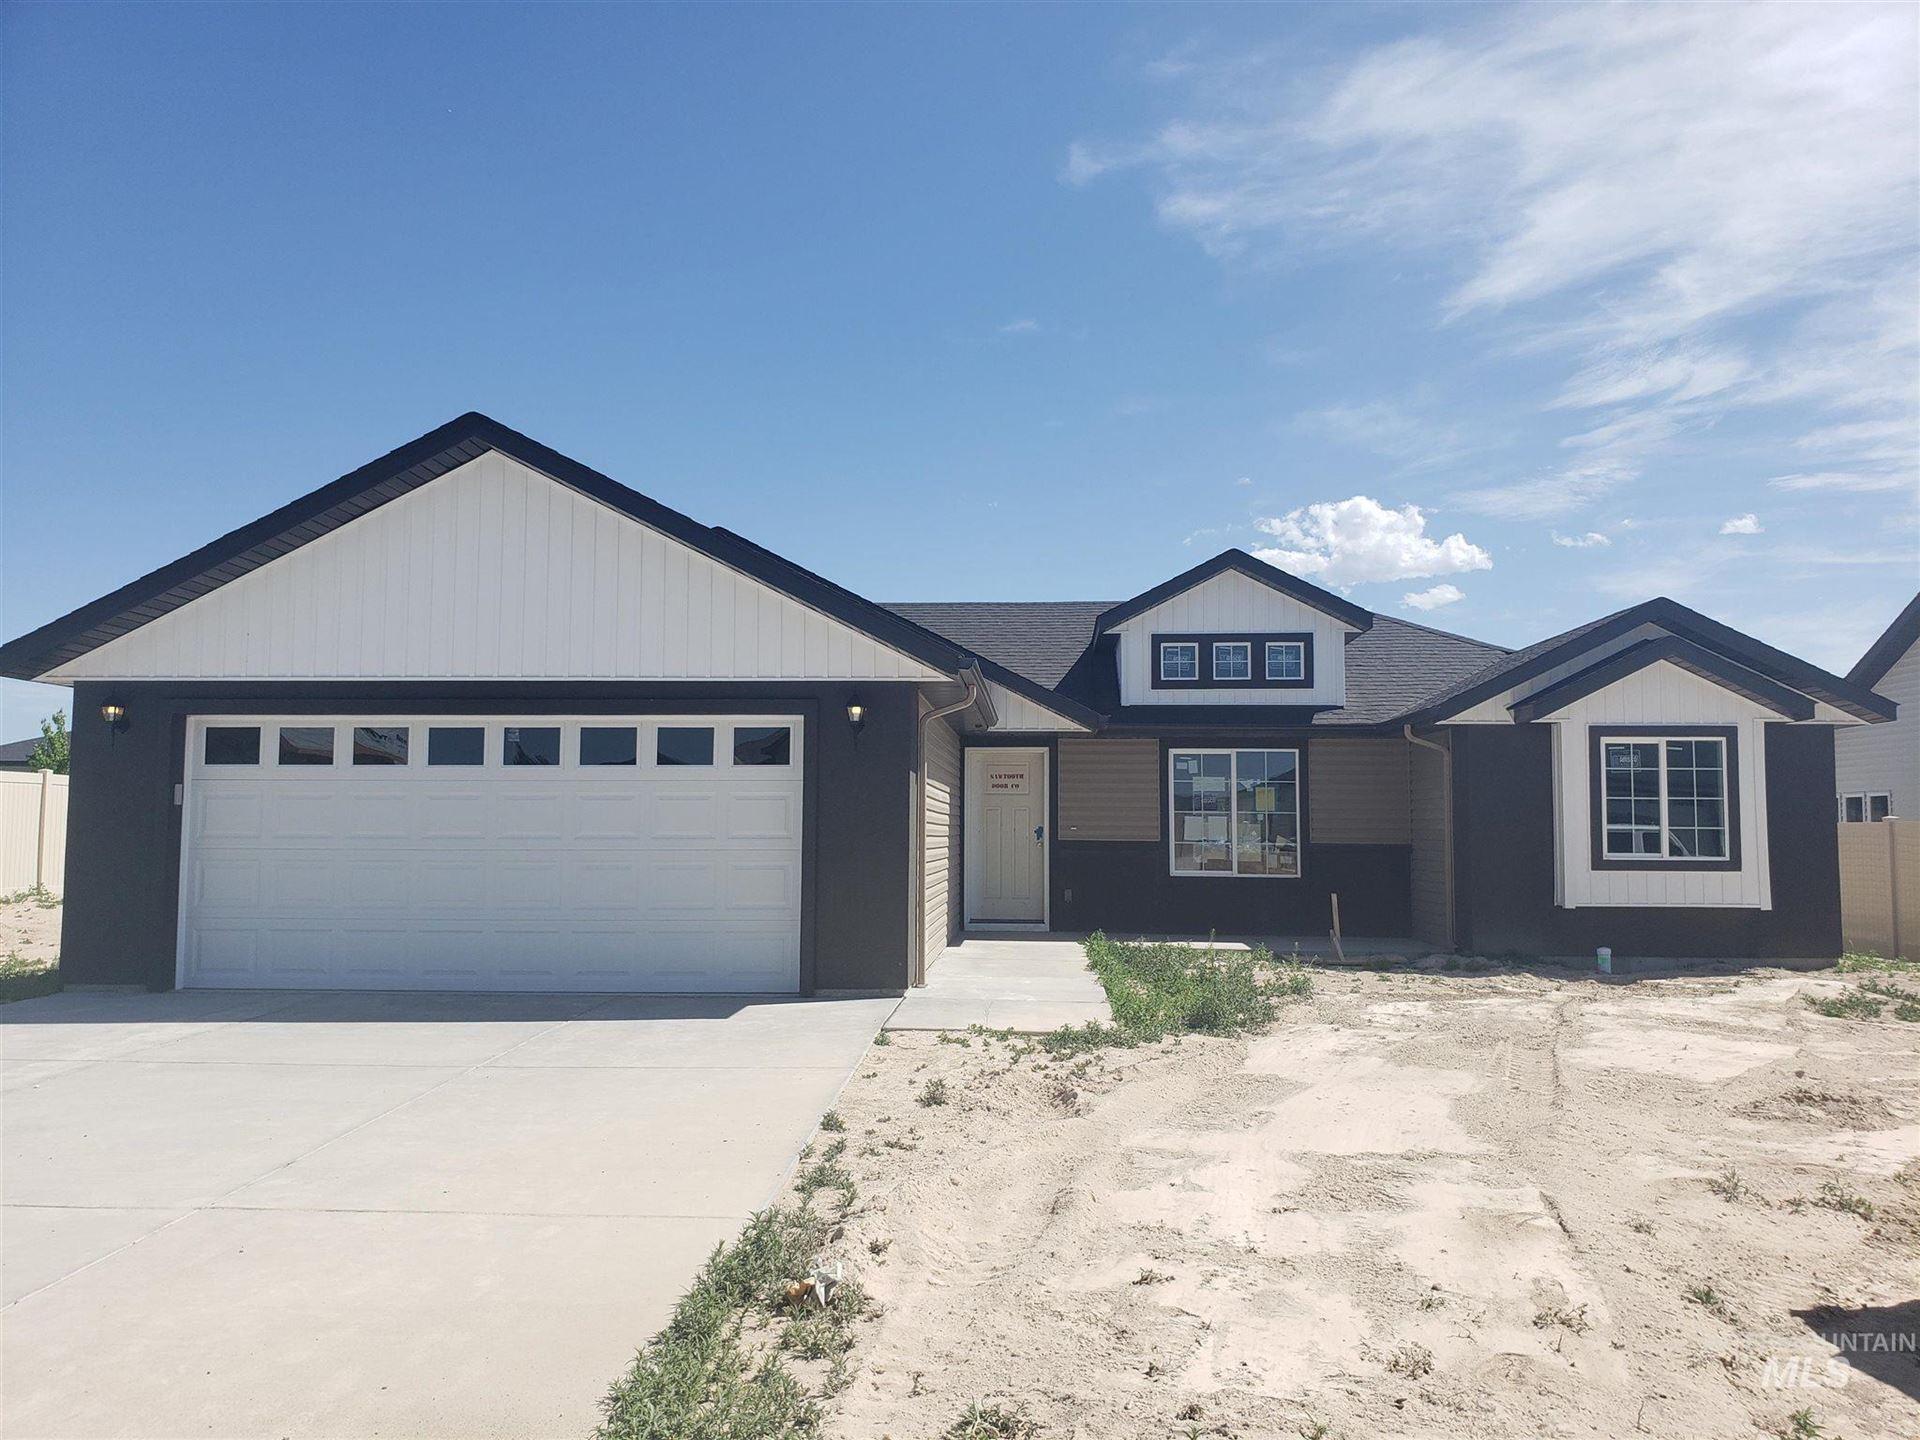 Photo of 1025 Elk Butte Avenue, Kimberly, ID 83341 (MLS # 98807059)